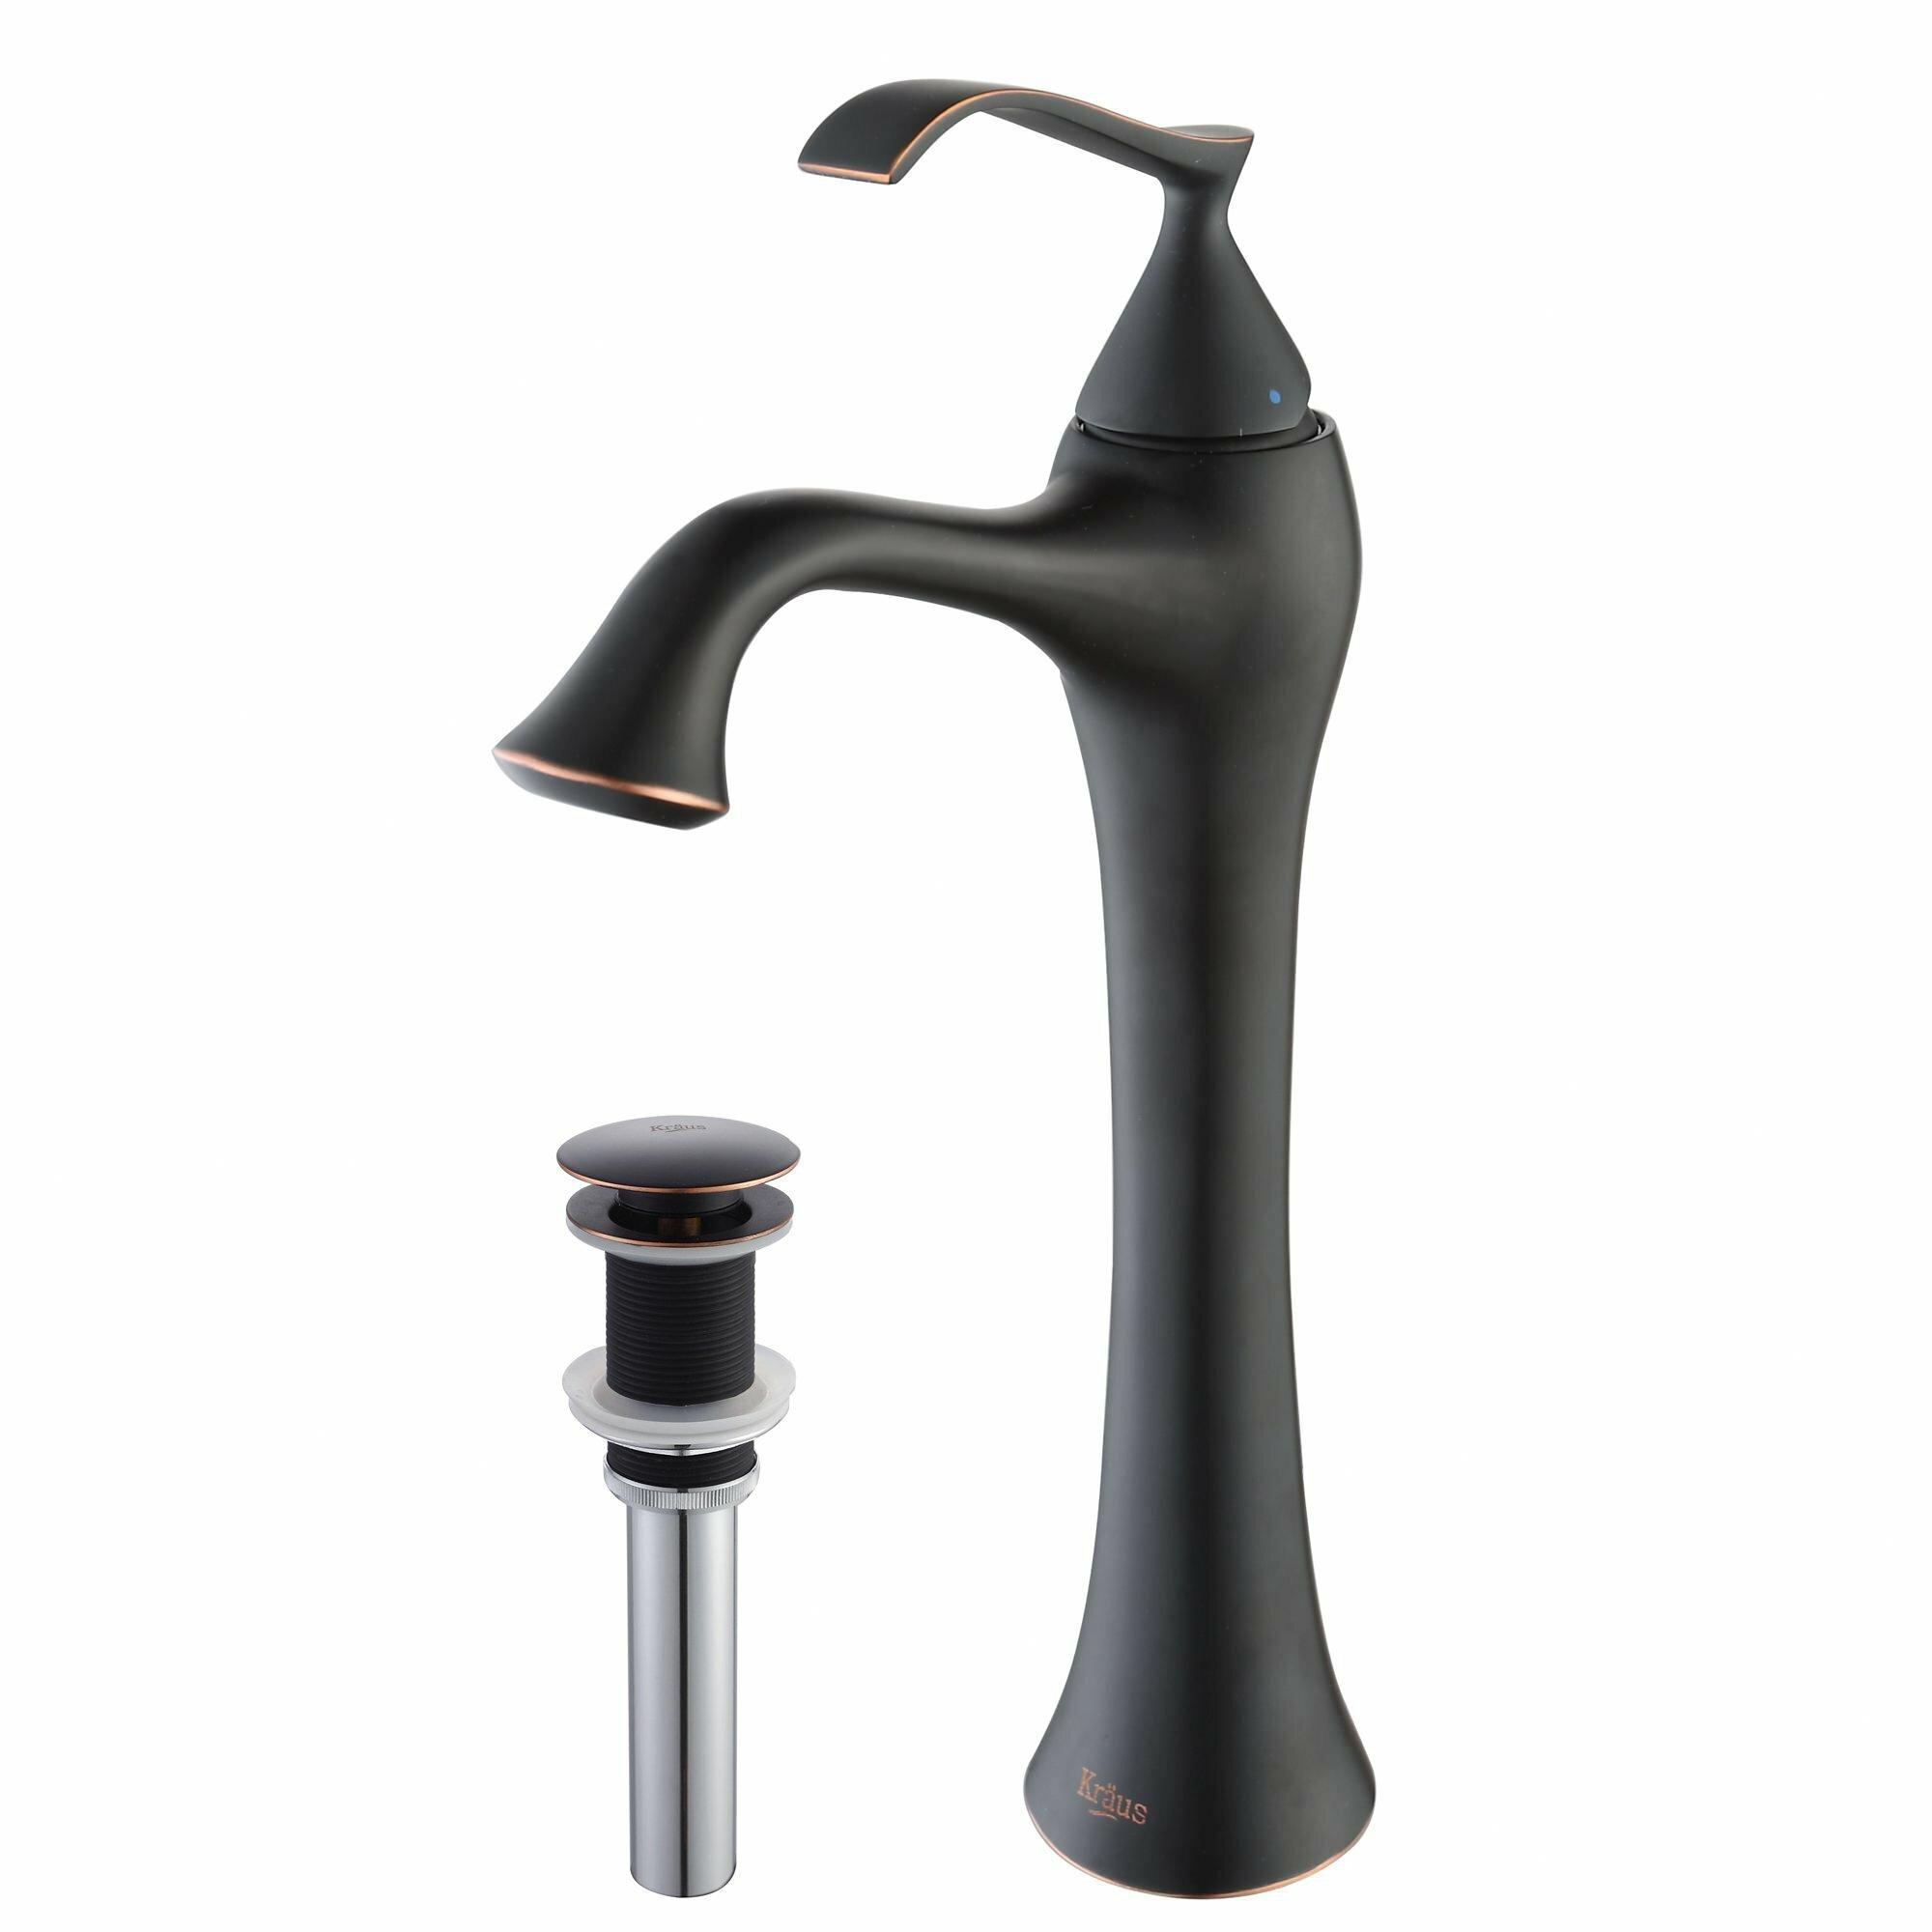 Ventus Single Hole Bathroom Faucet with Single Handle Wayfair